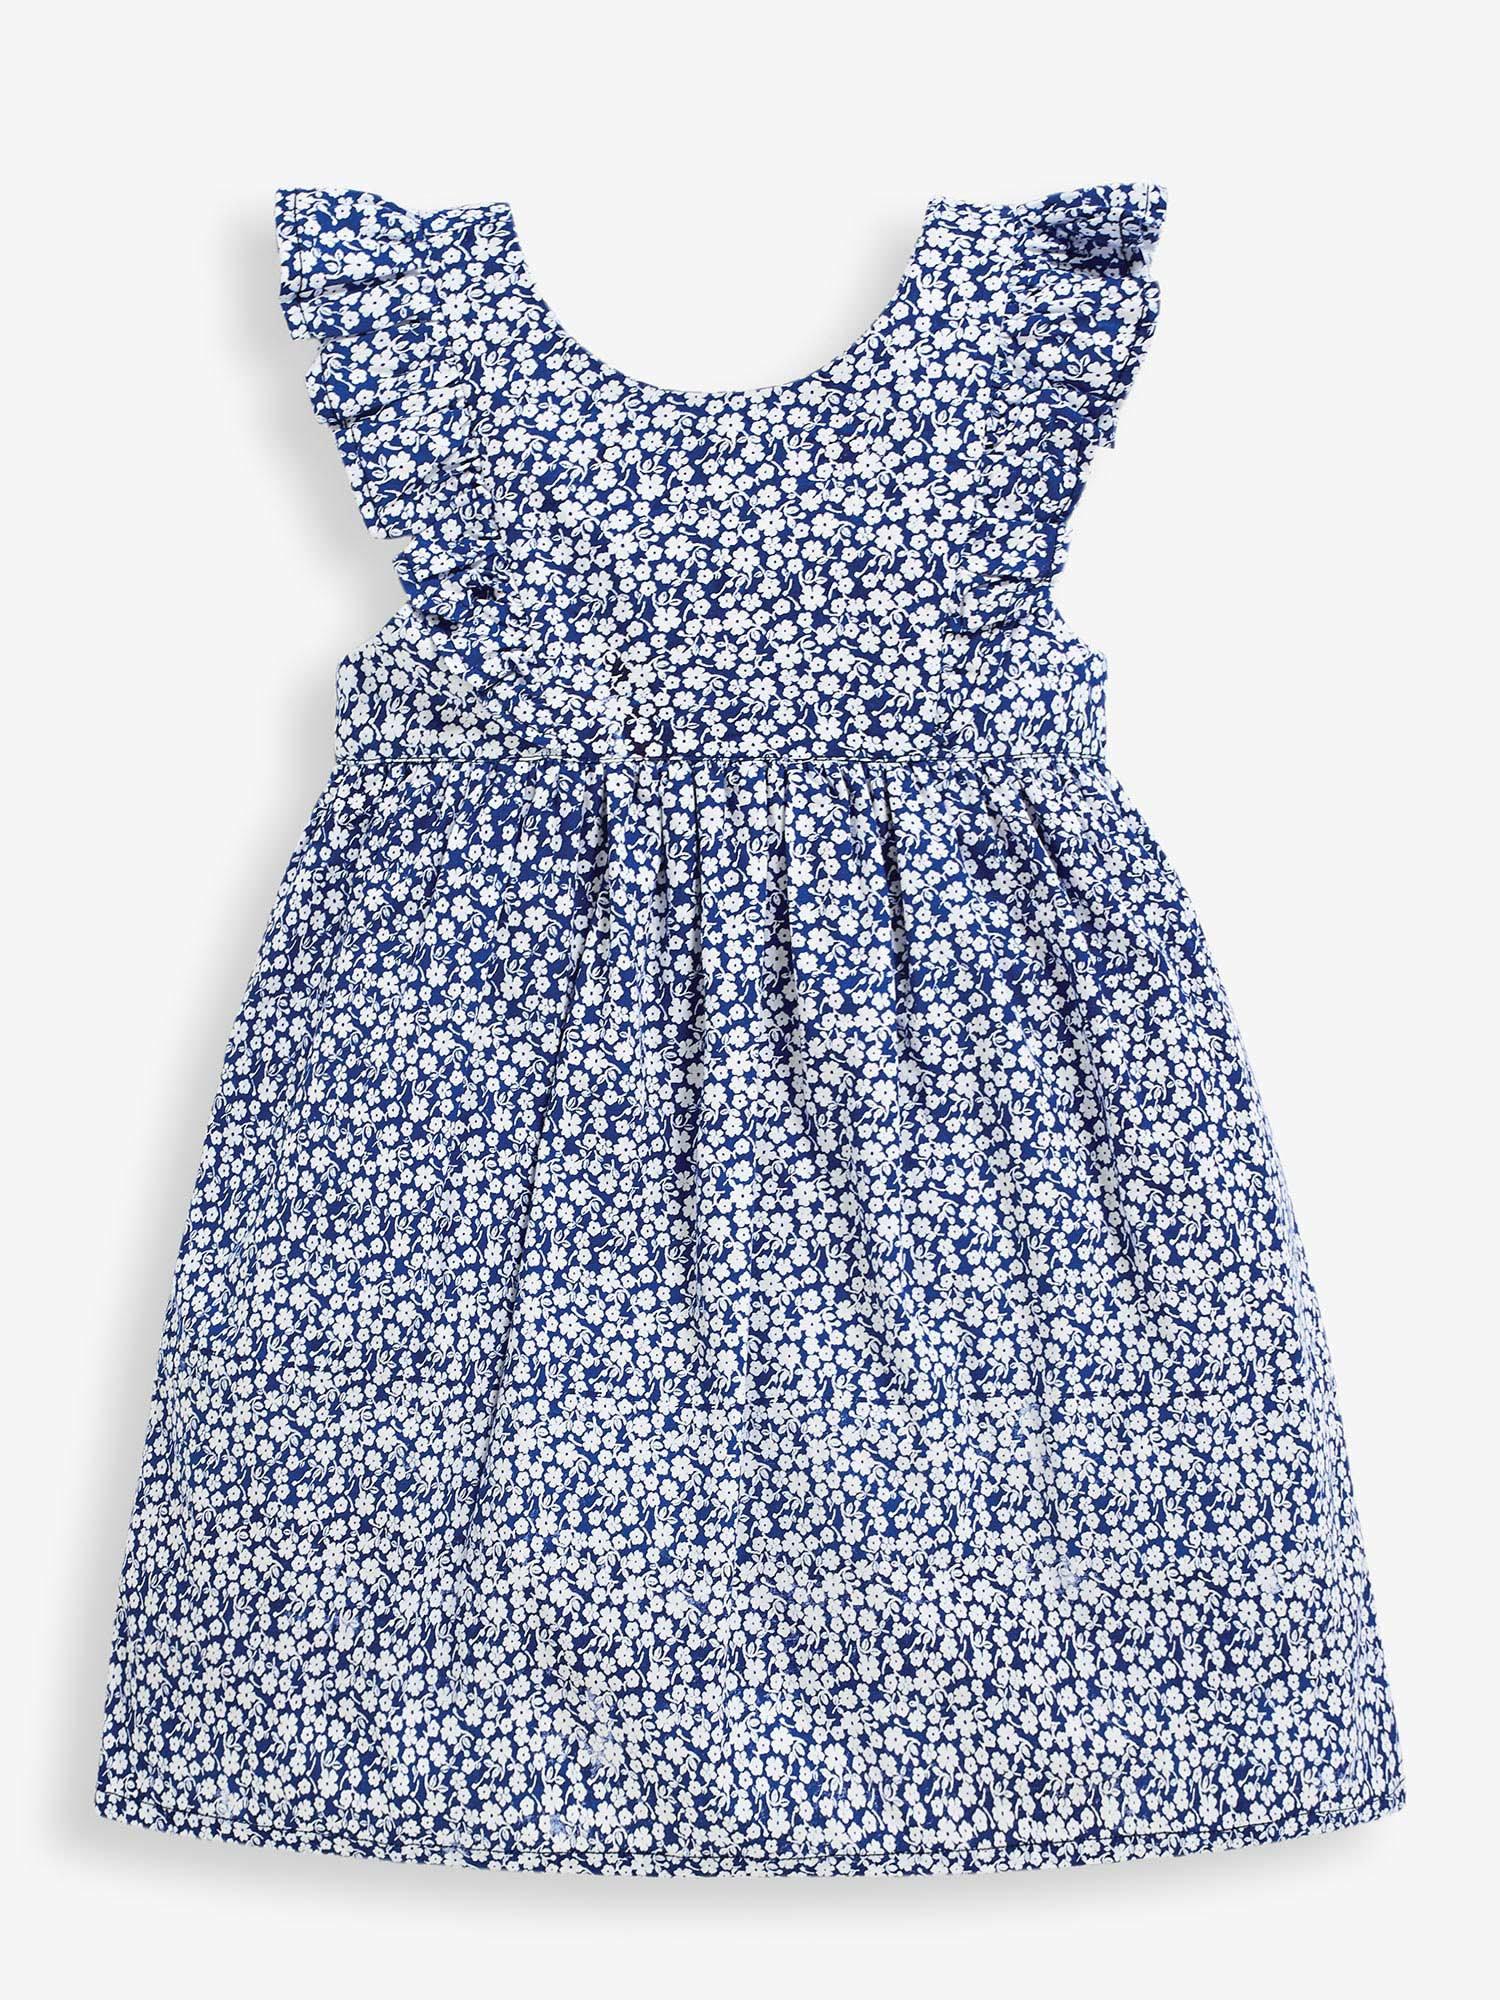 JoJo Maman Bebe Navy Ditsy Summer Dress